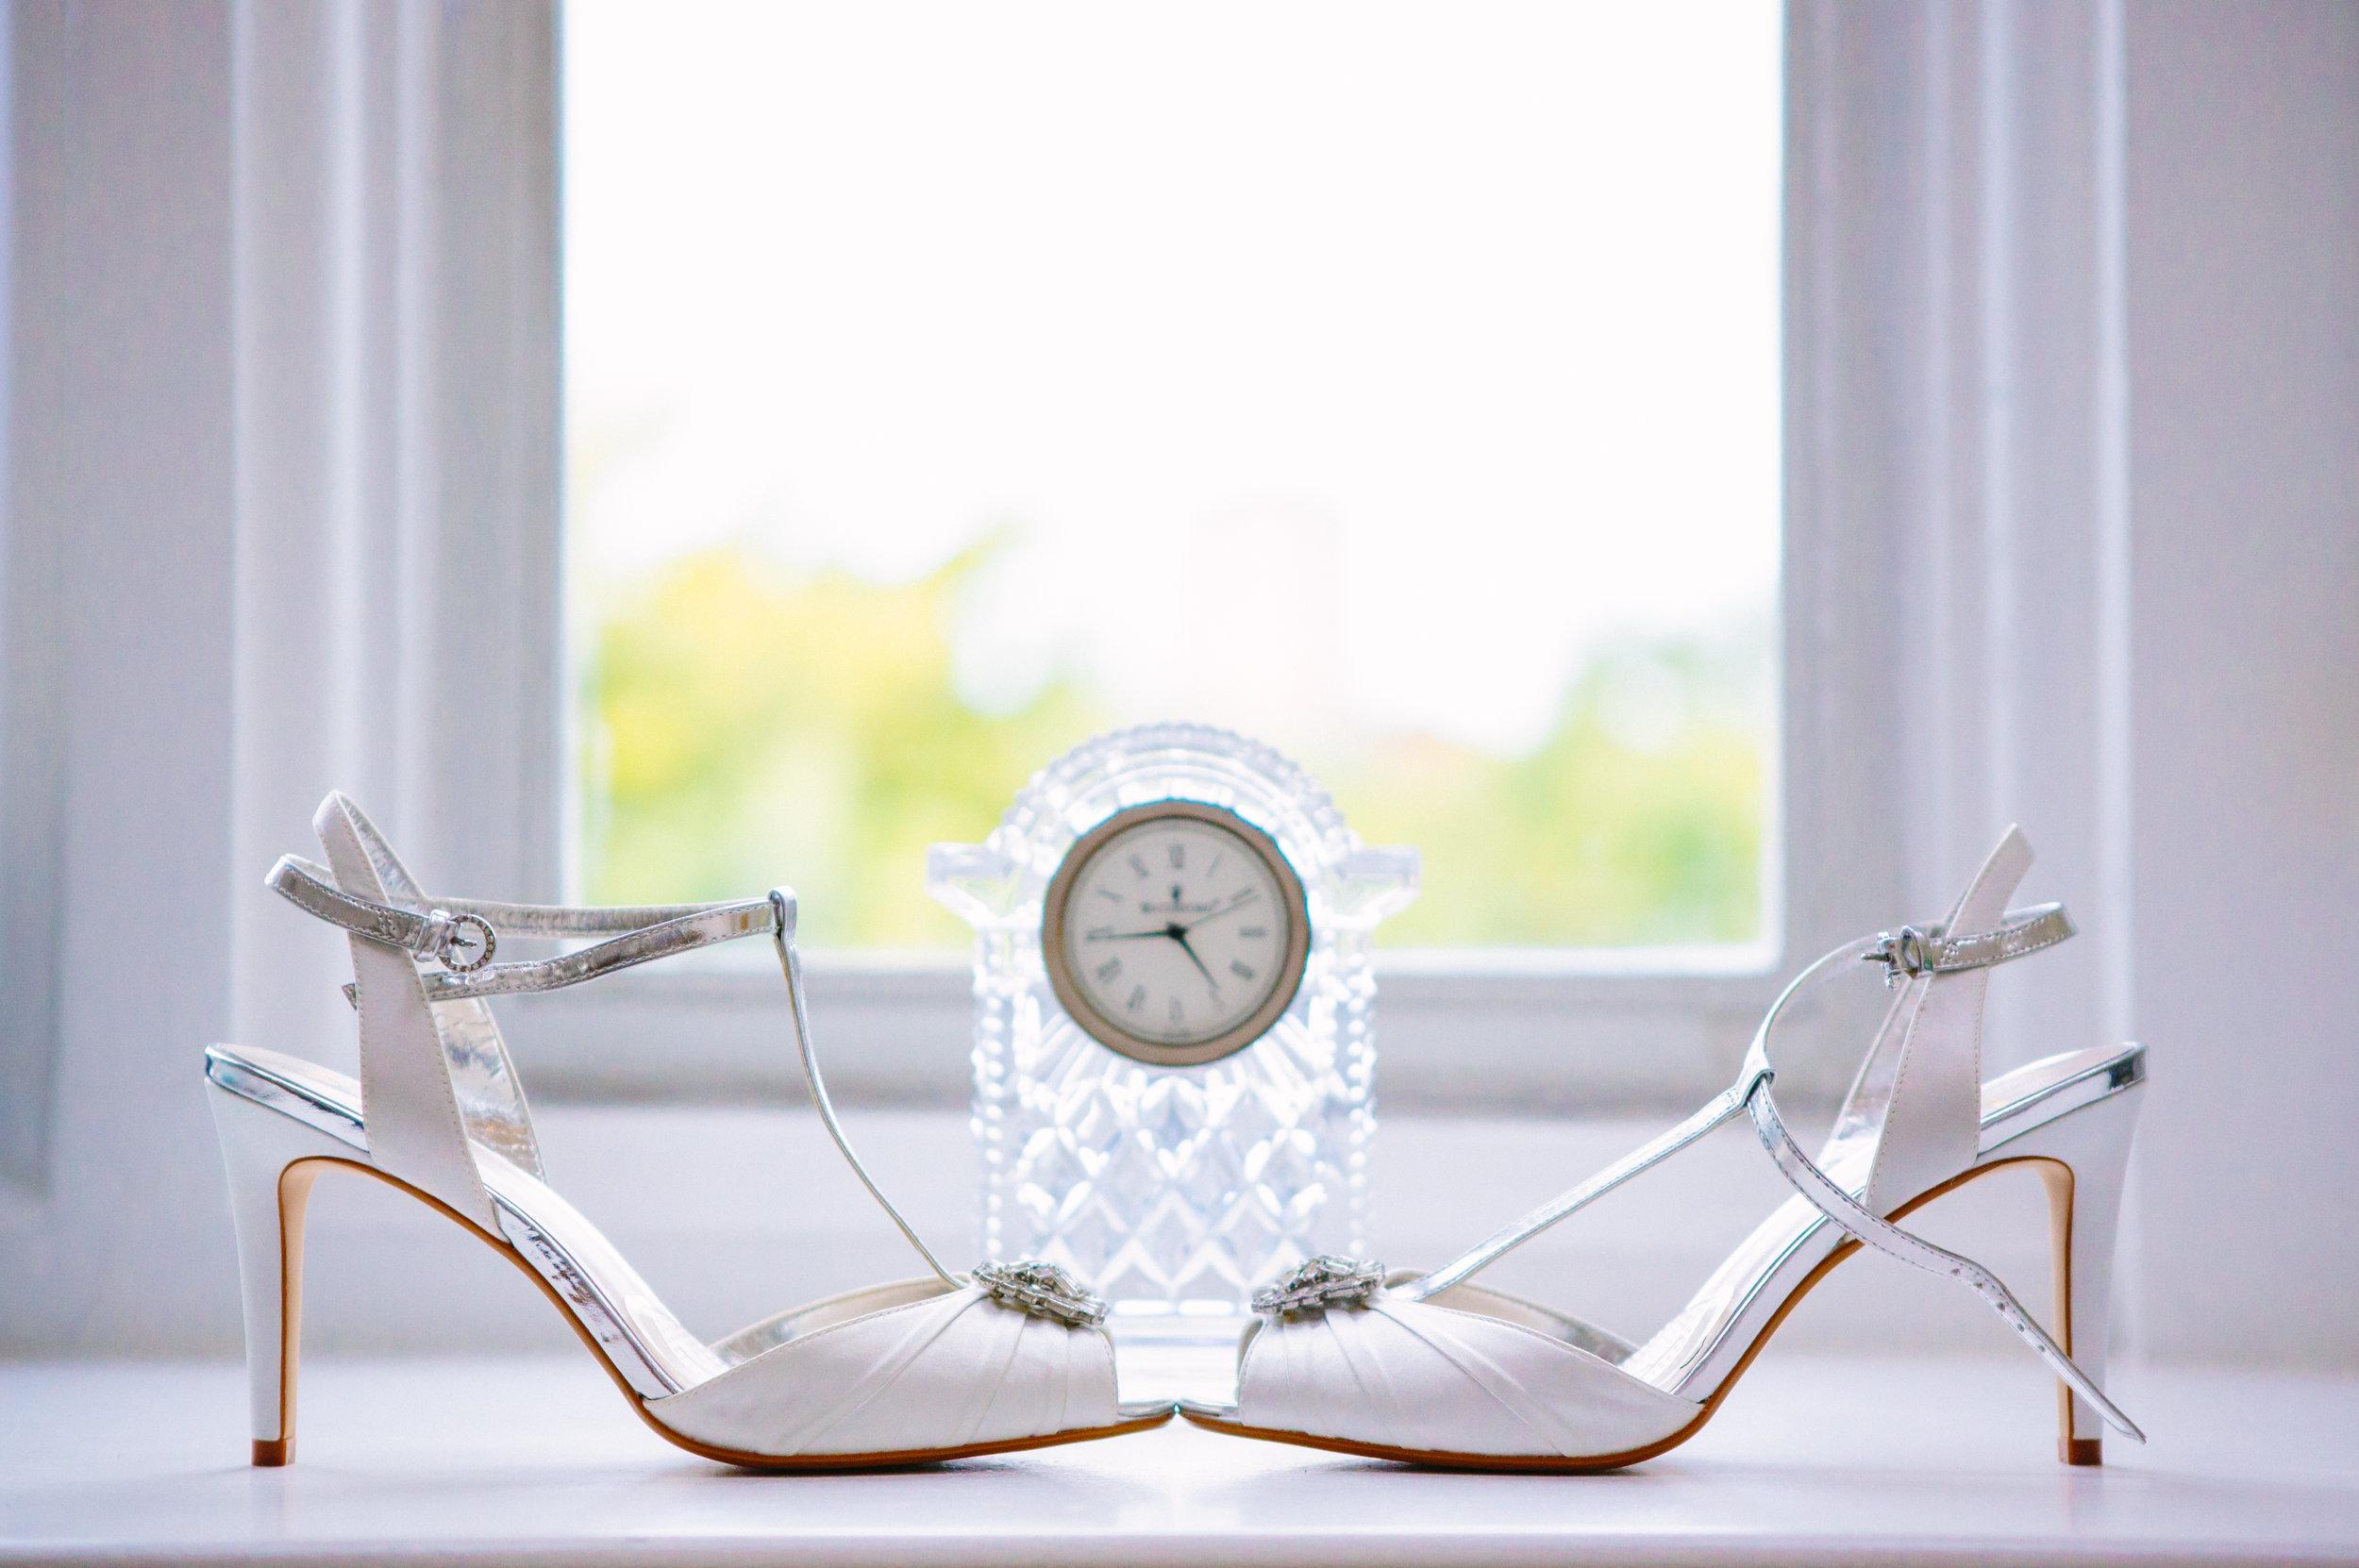 london-wedding-photography-wimbledon-wandsworth-town-hall-registry-bridal-prep-shoes-03